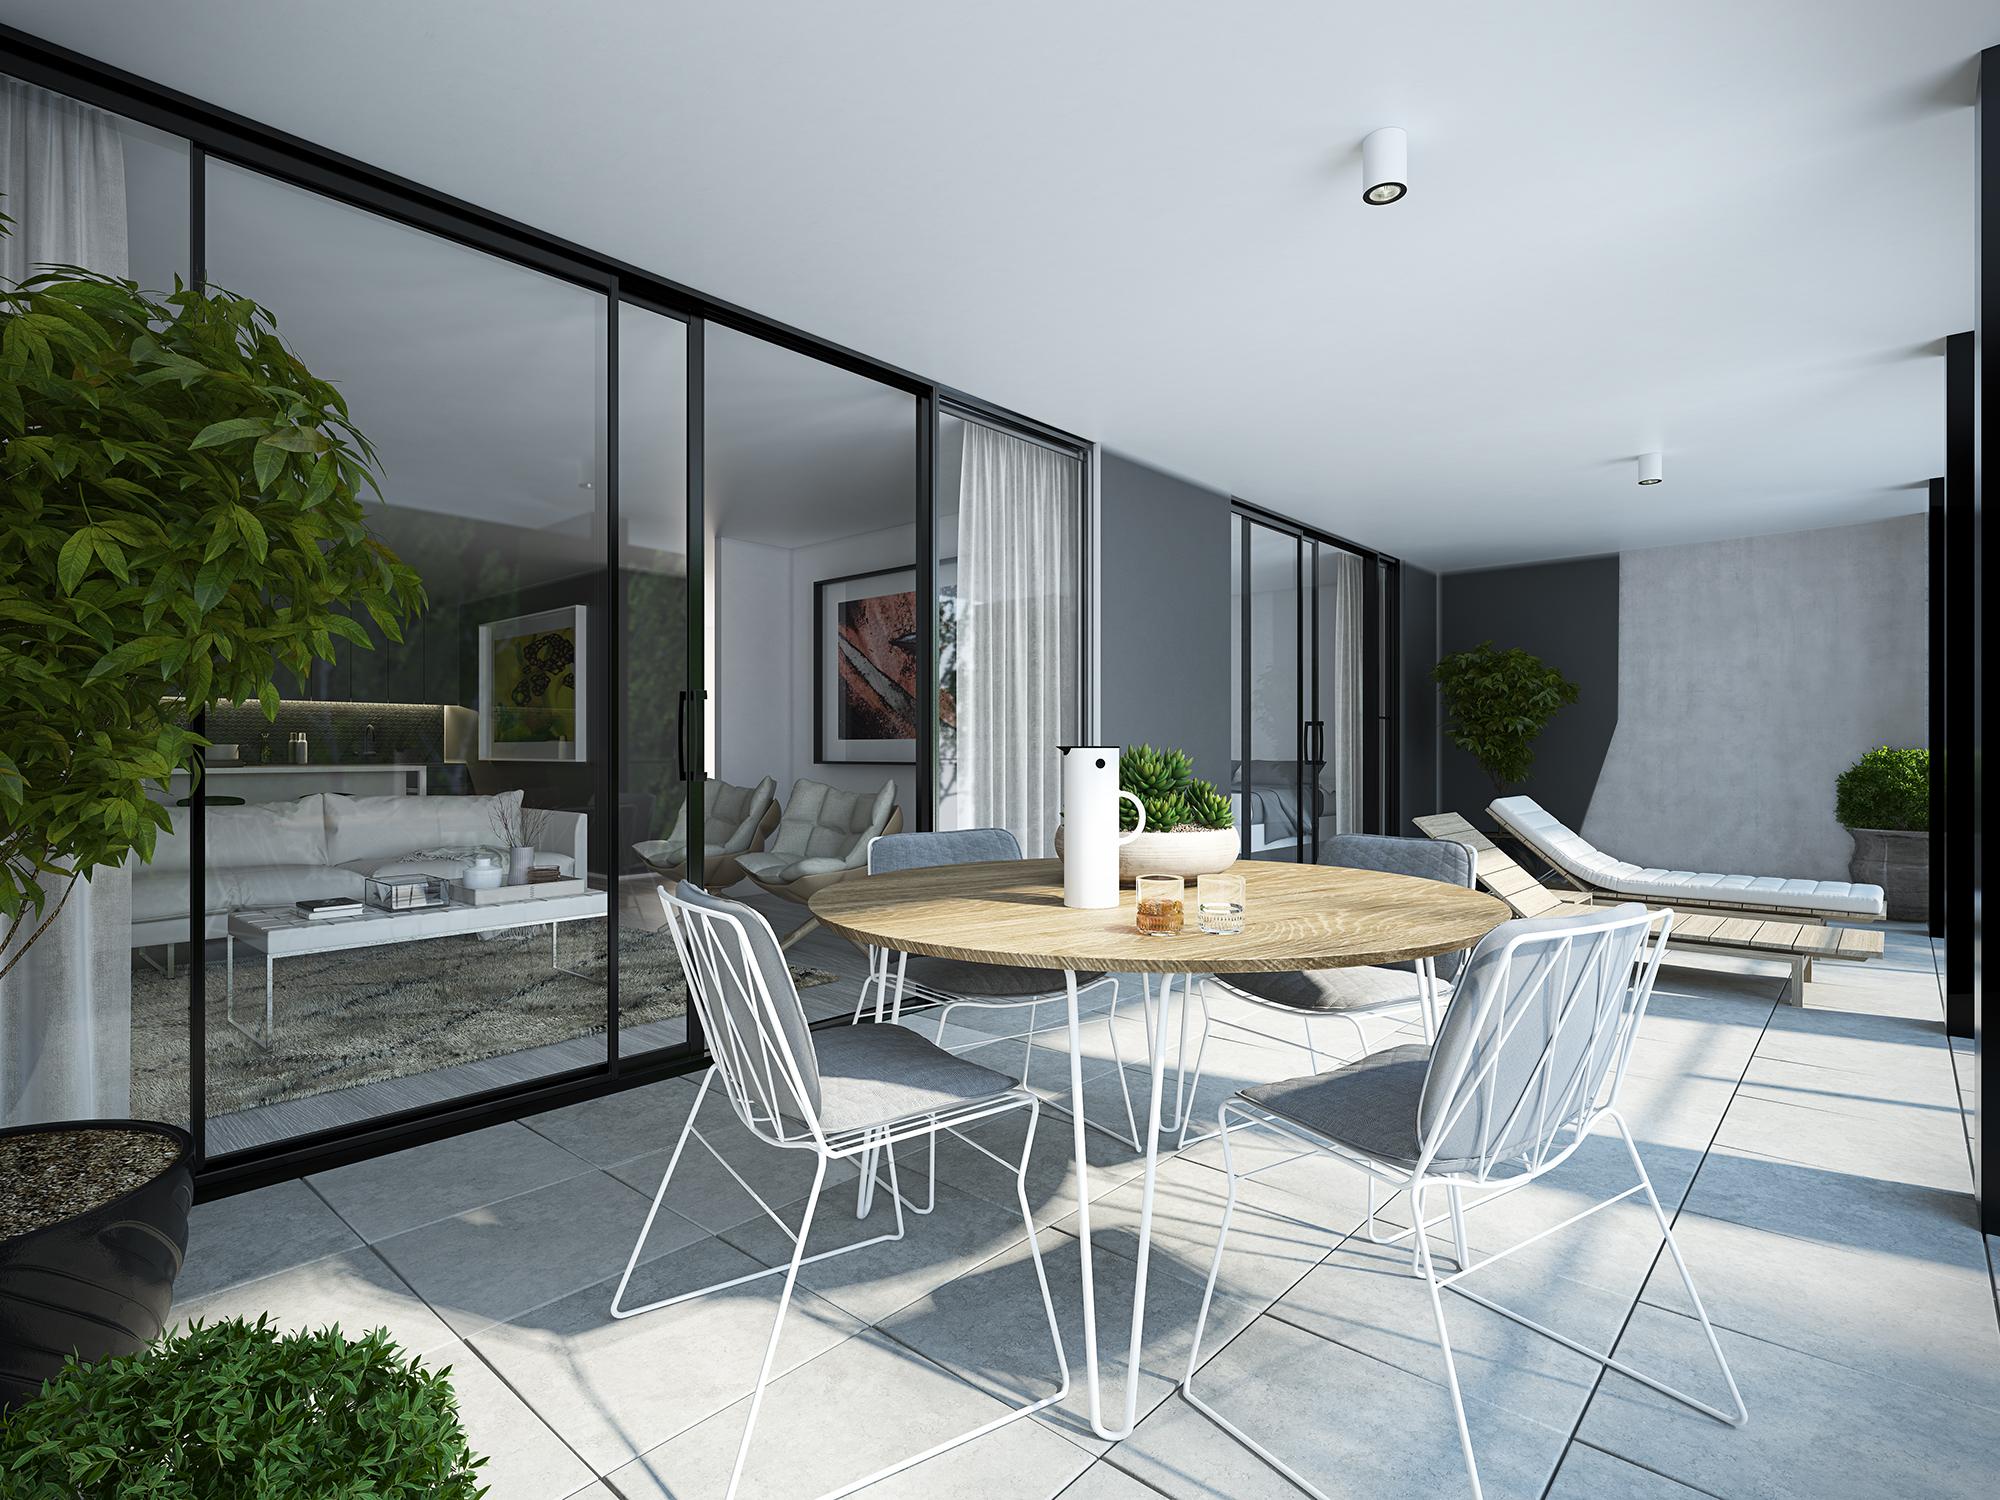 Hive case study by Chamberlain Architects